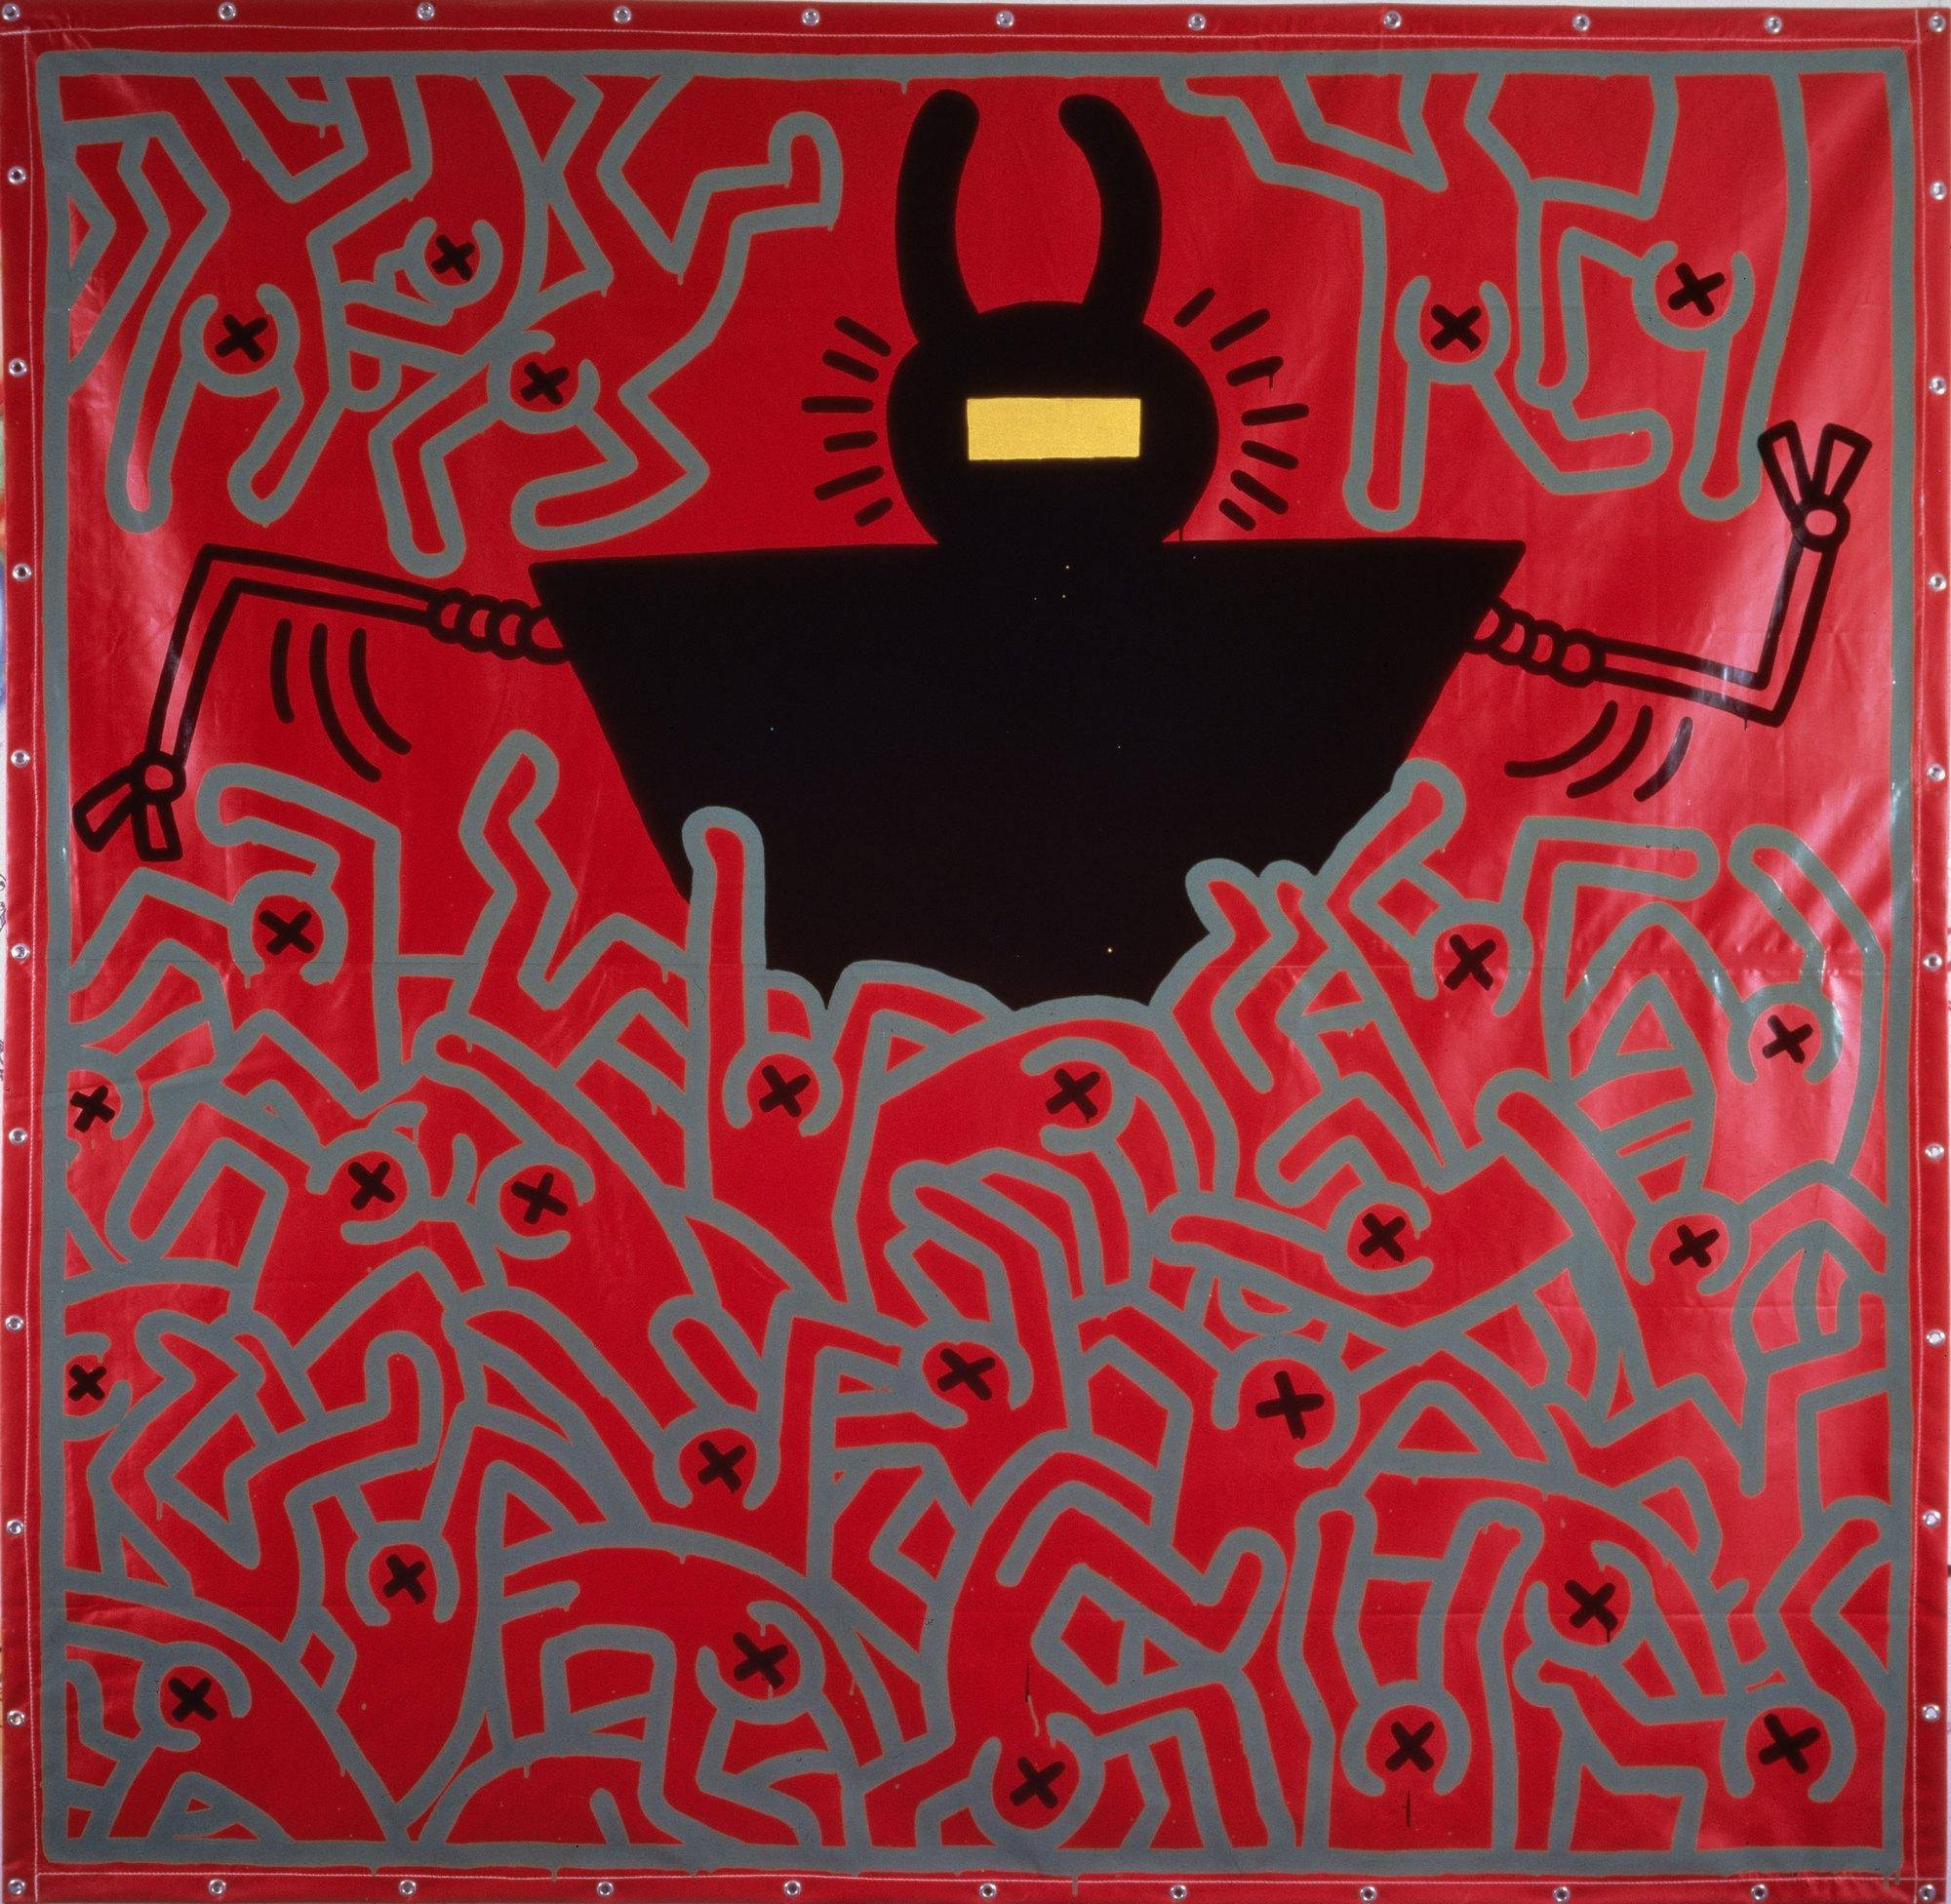 "Keith Haring, ""Untitled"", 1983, © bpk/Nationalgalerie im Hamburger Bahnhof, SMB, Sammlung Marx, © Keith Haring Foundation. Zdjęcie: Jochen Littkemann (źródło: materiały prasowe organizatora wystawy)"